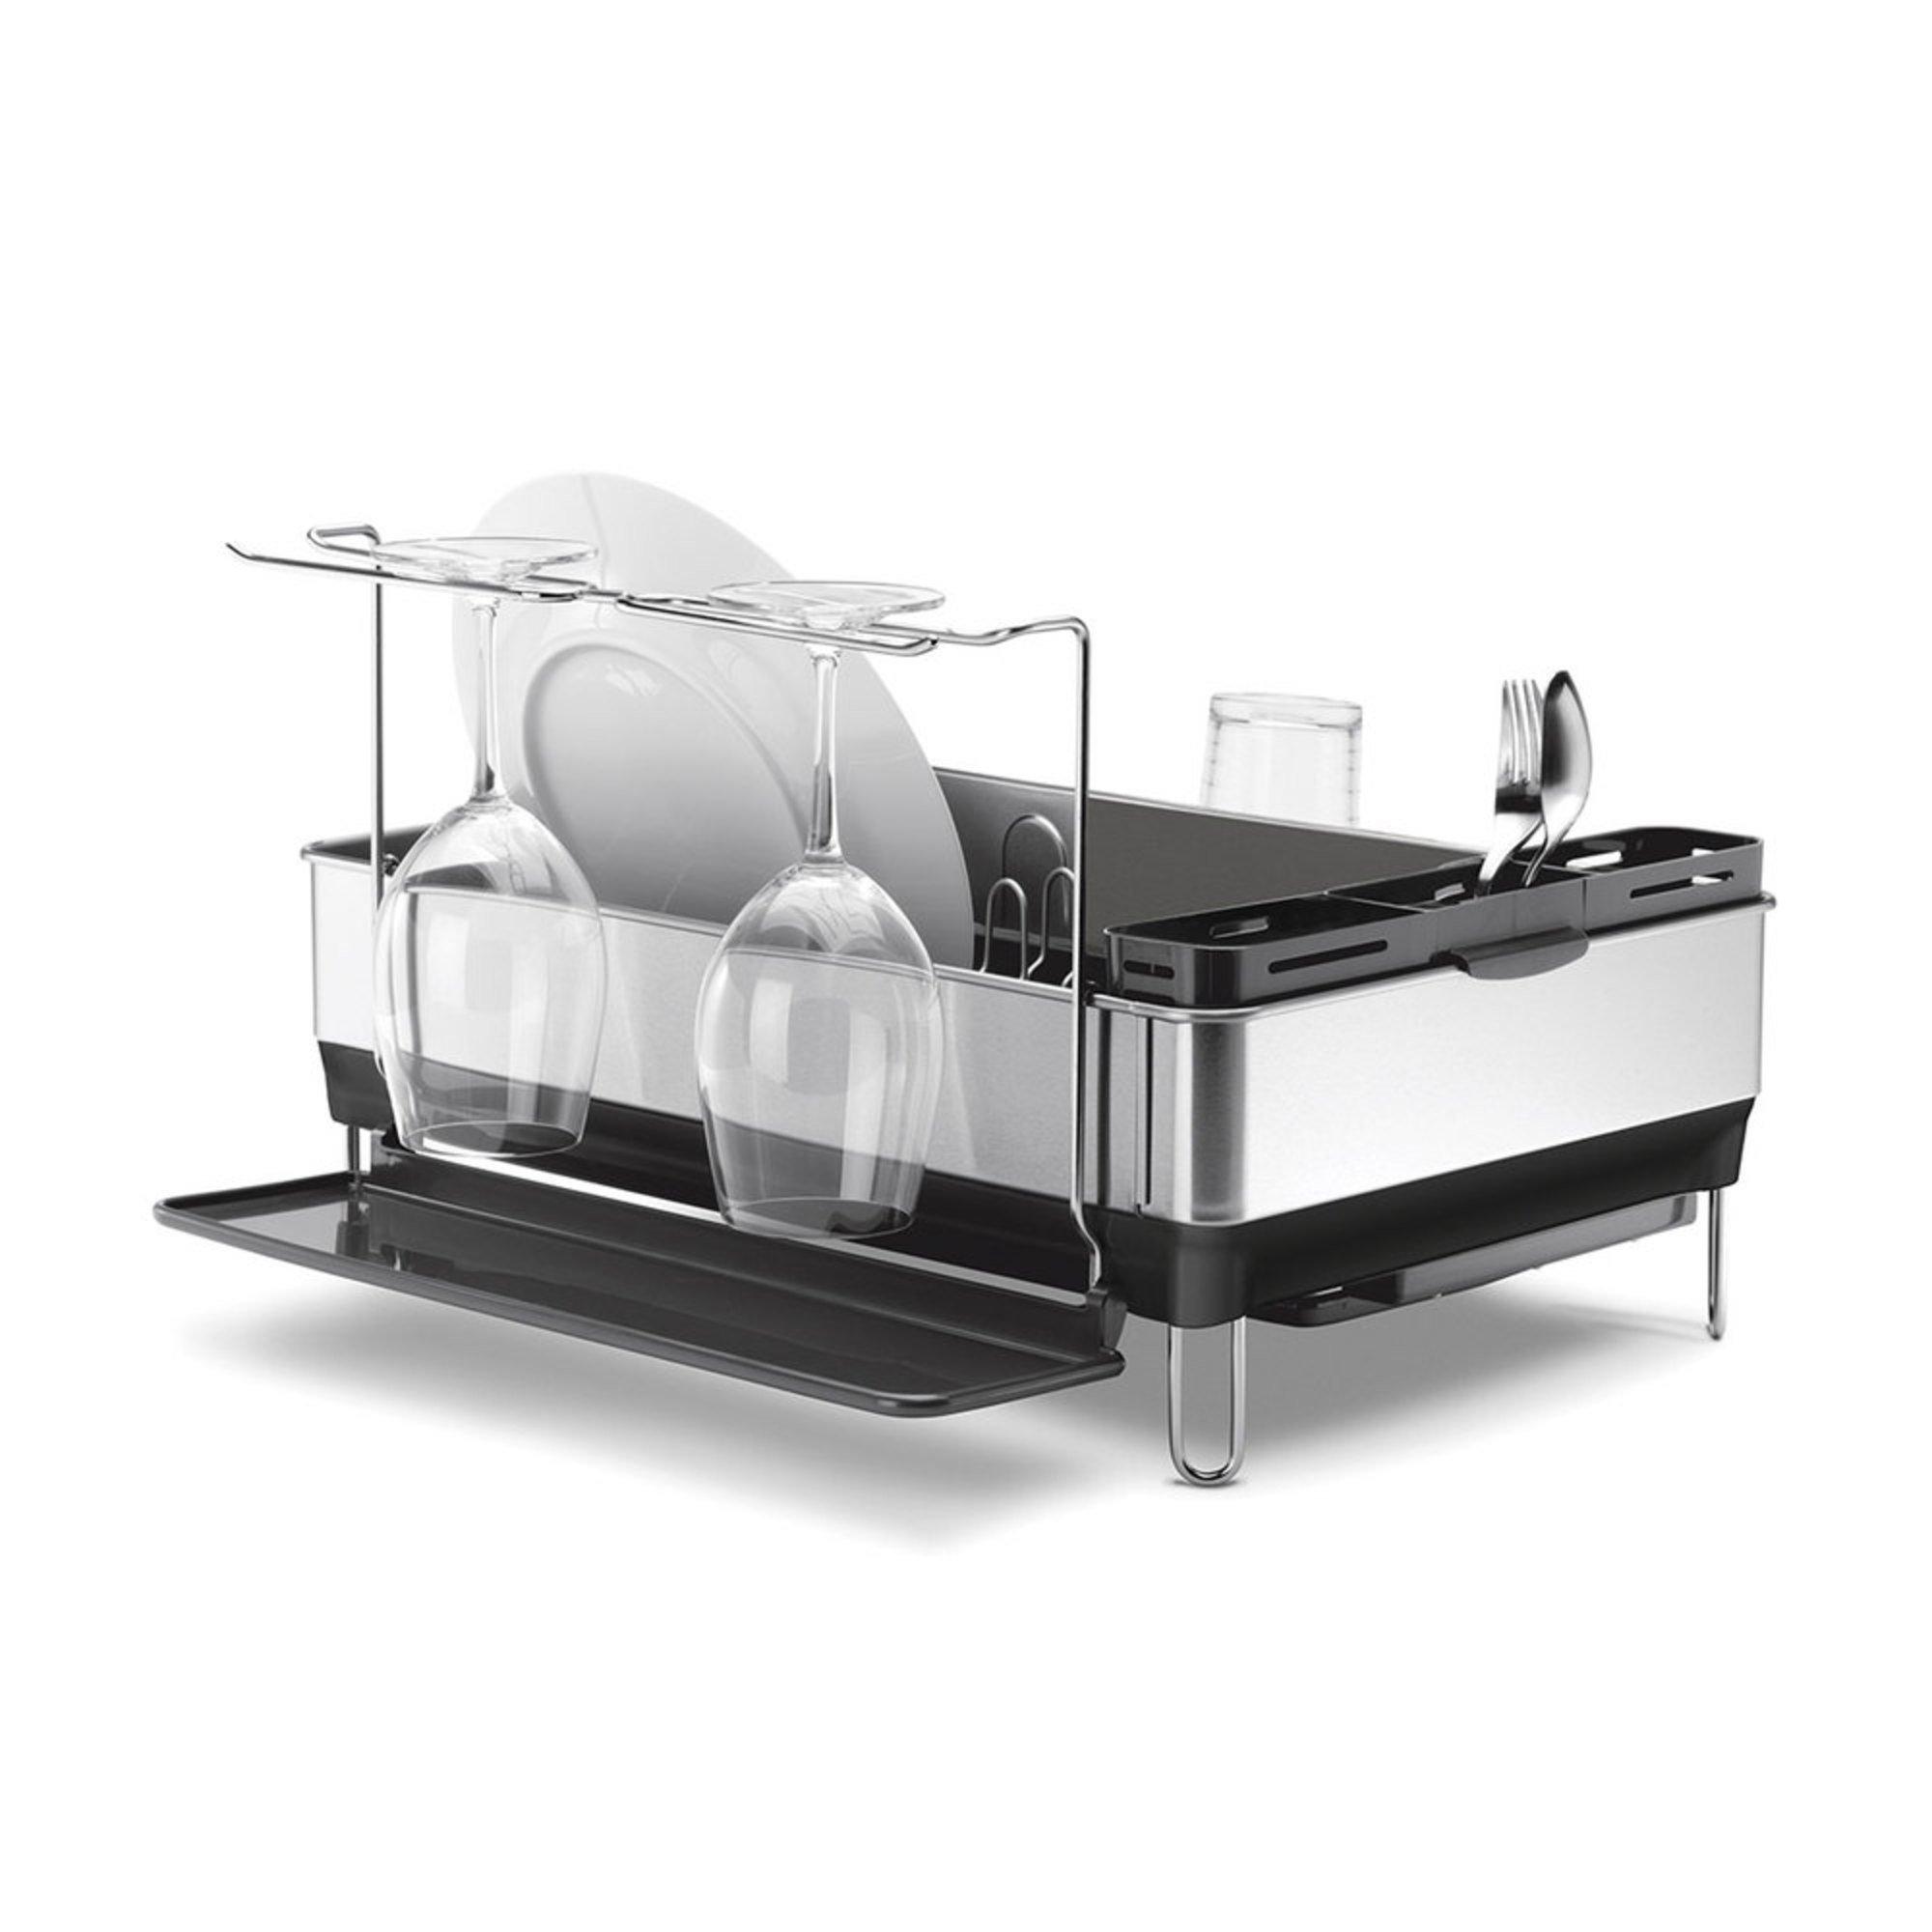 simplehuman steel frame dish rack with wine glass slot